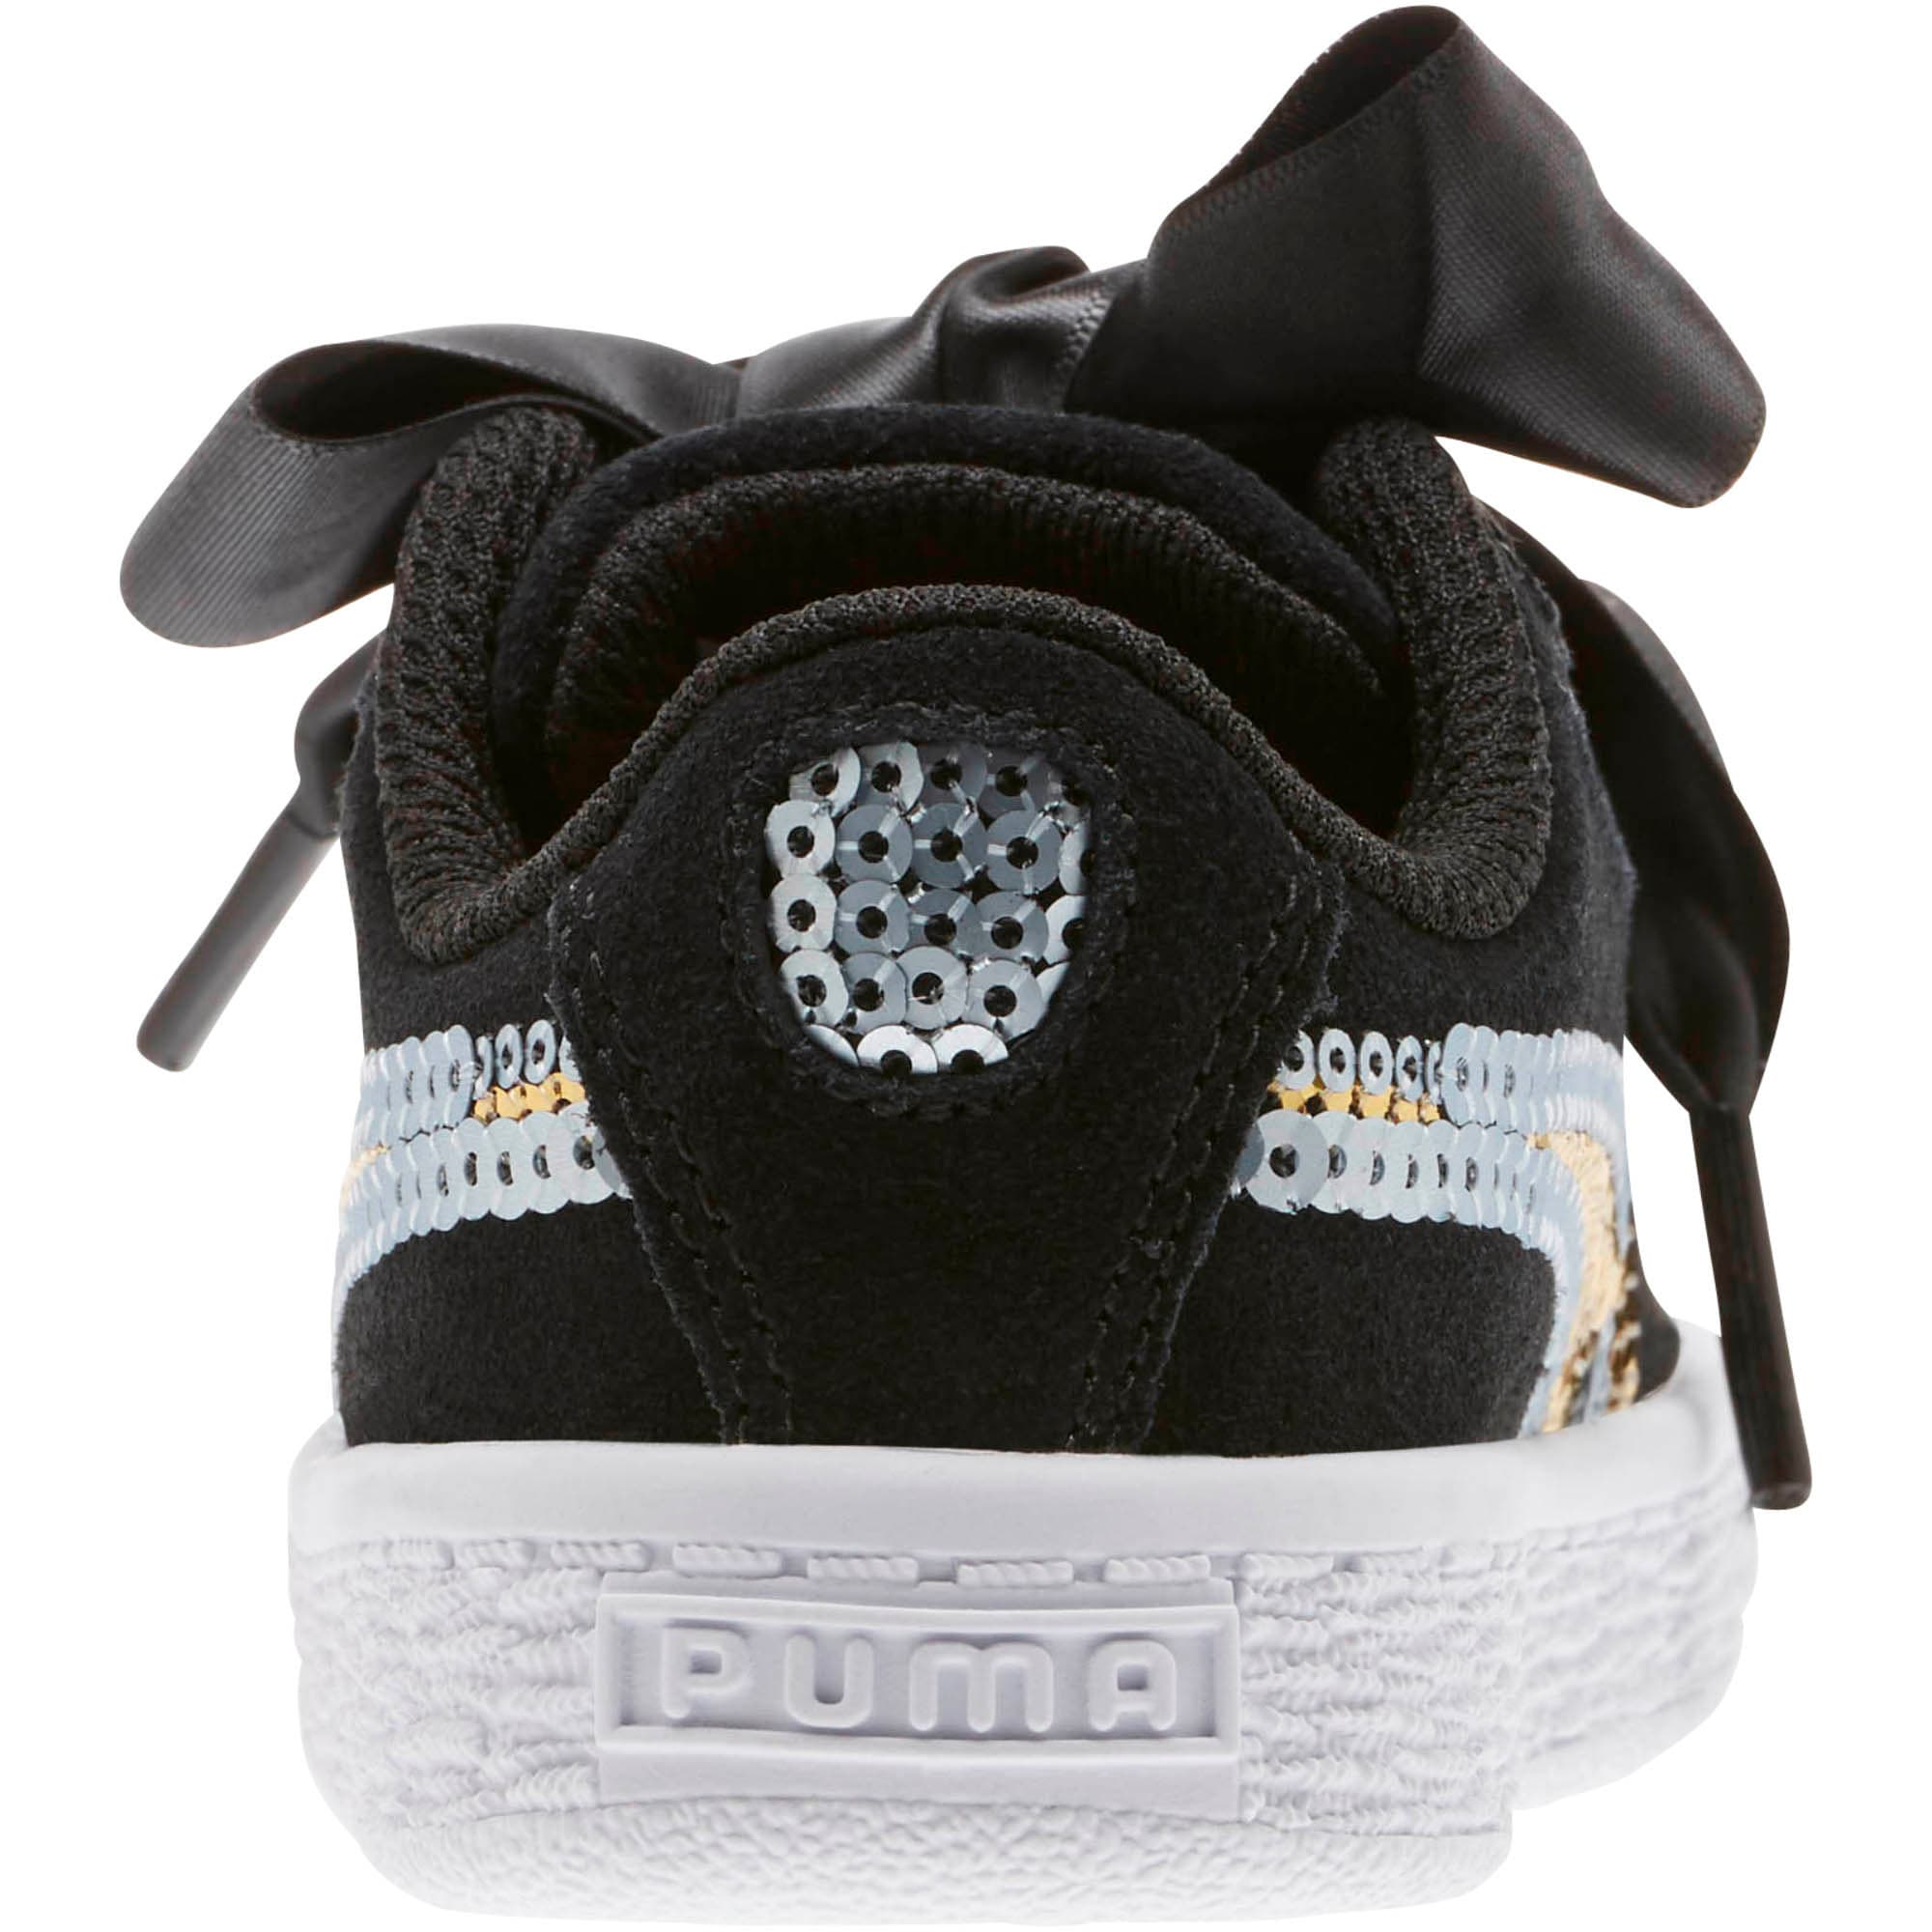 Thumbnail 4 of Suede Heart Trailblazer Sequin Little Kids' Shoes, Puma Black-Puma Team Gold, medium